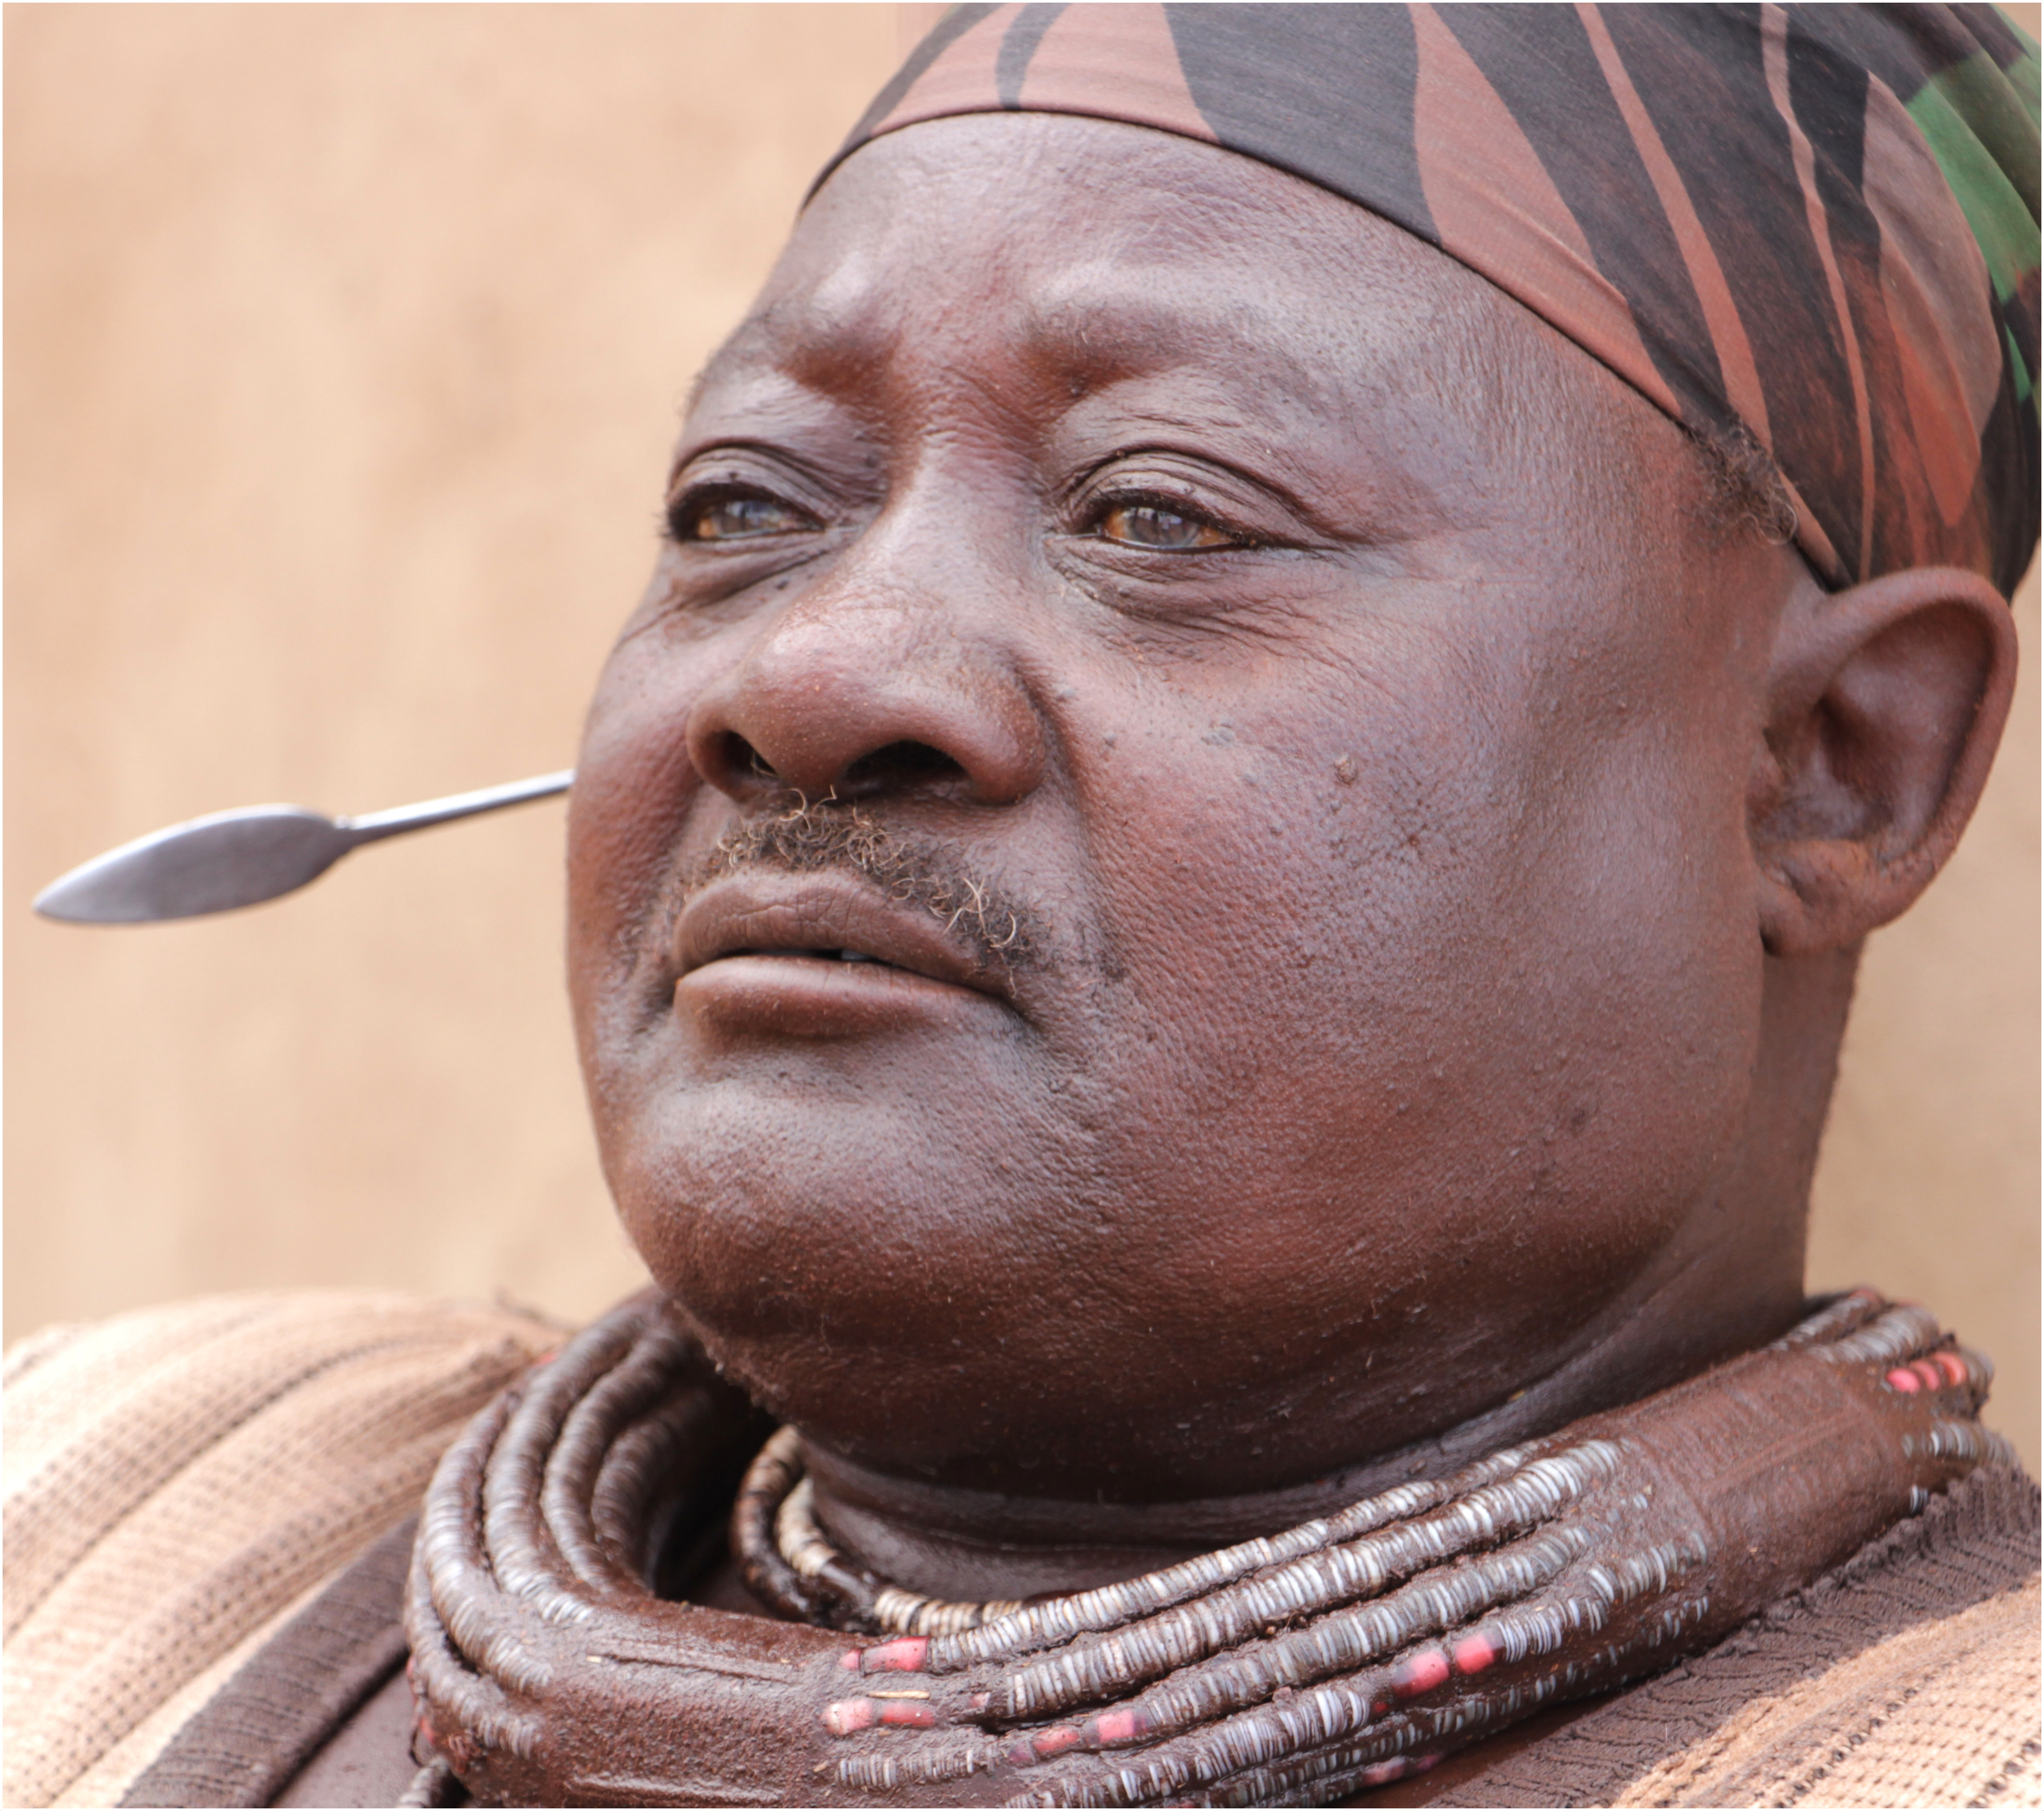 Chef Himba